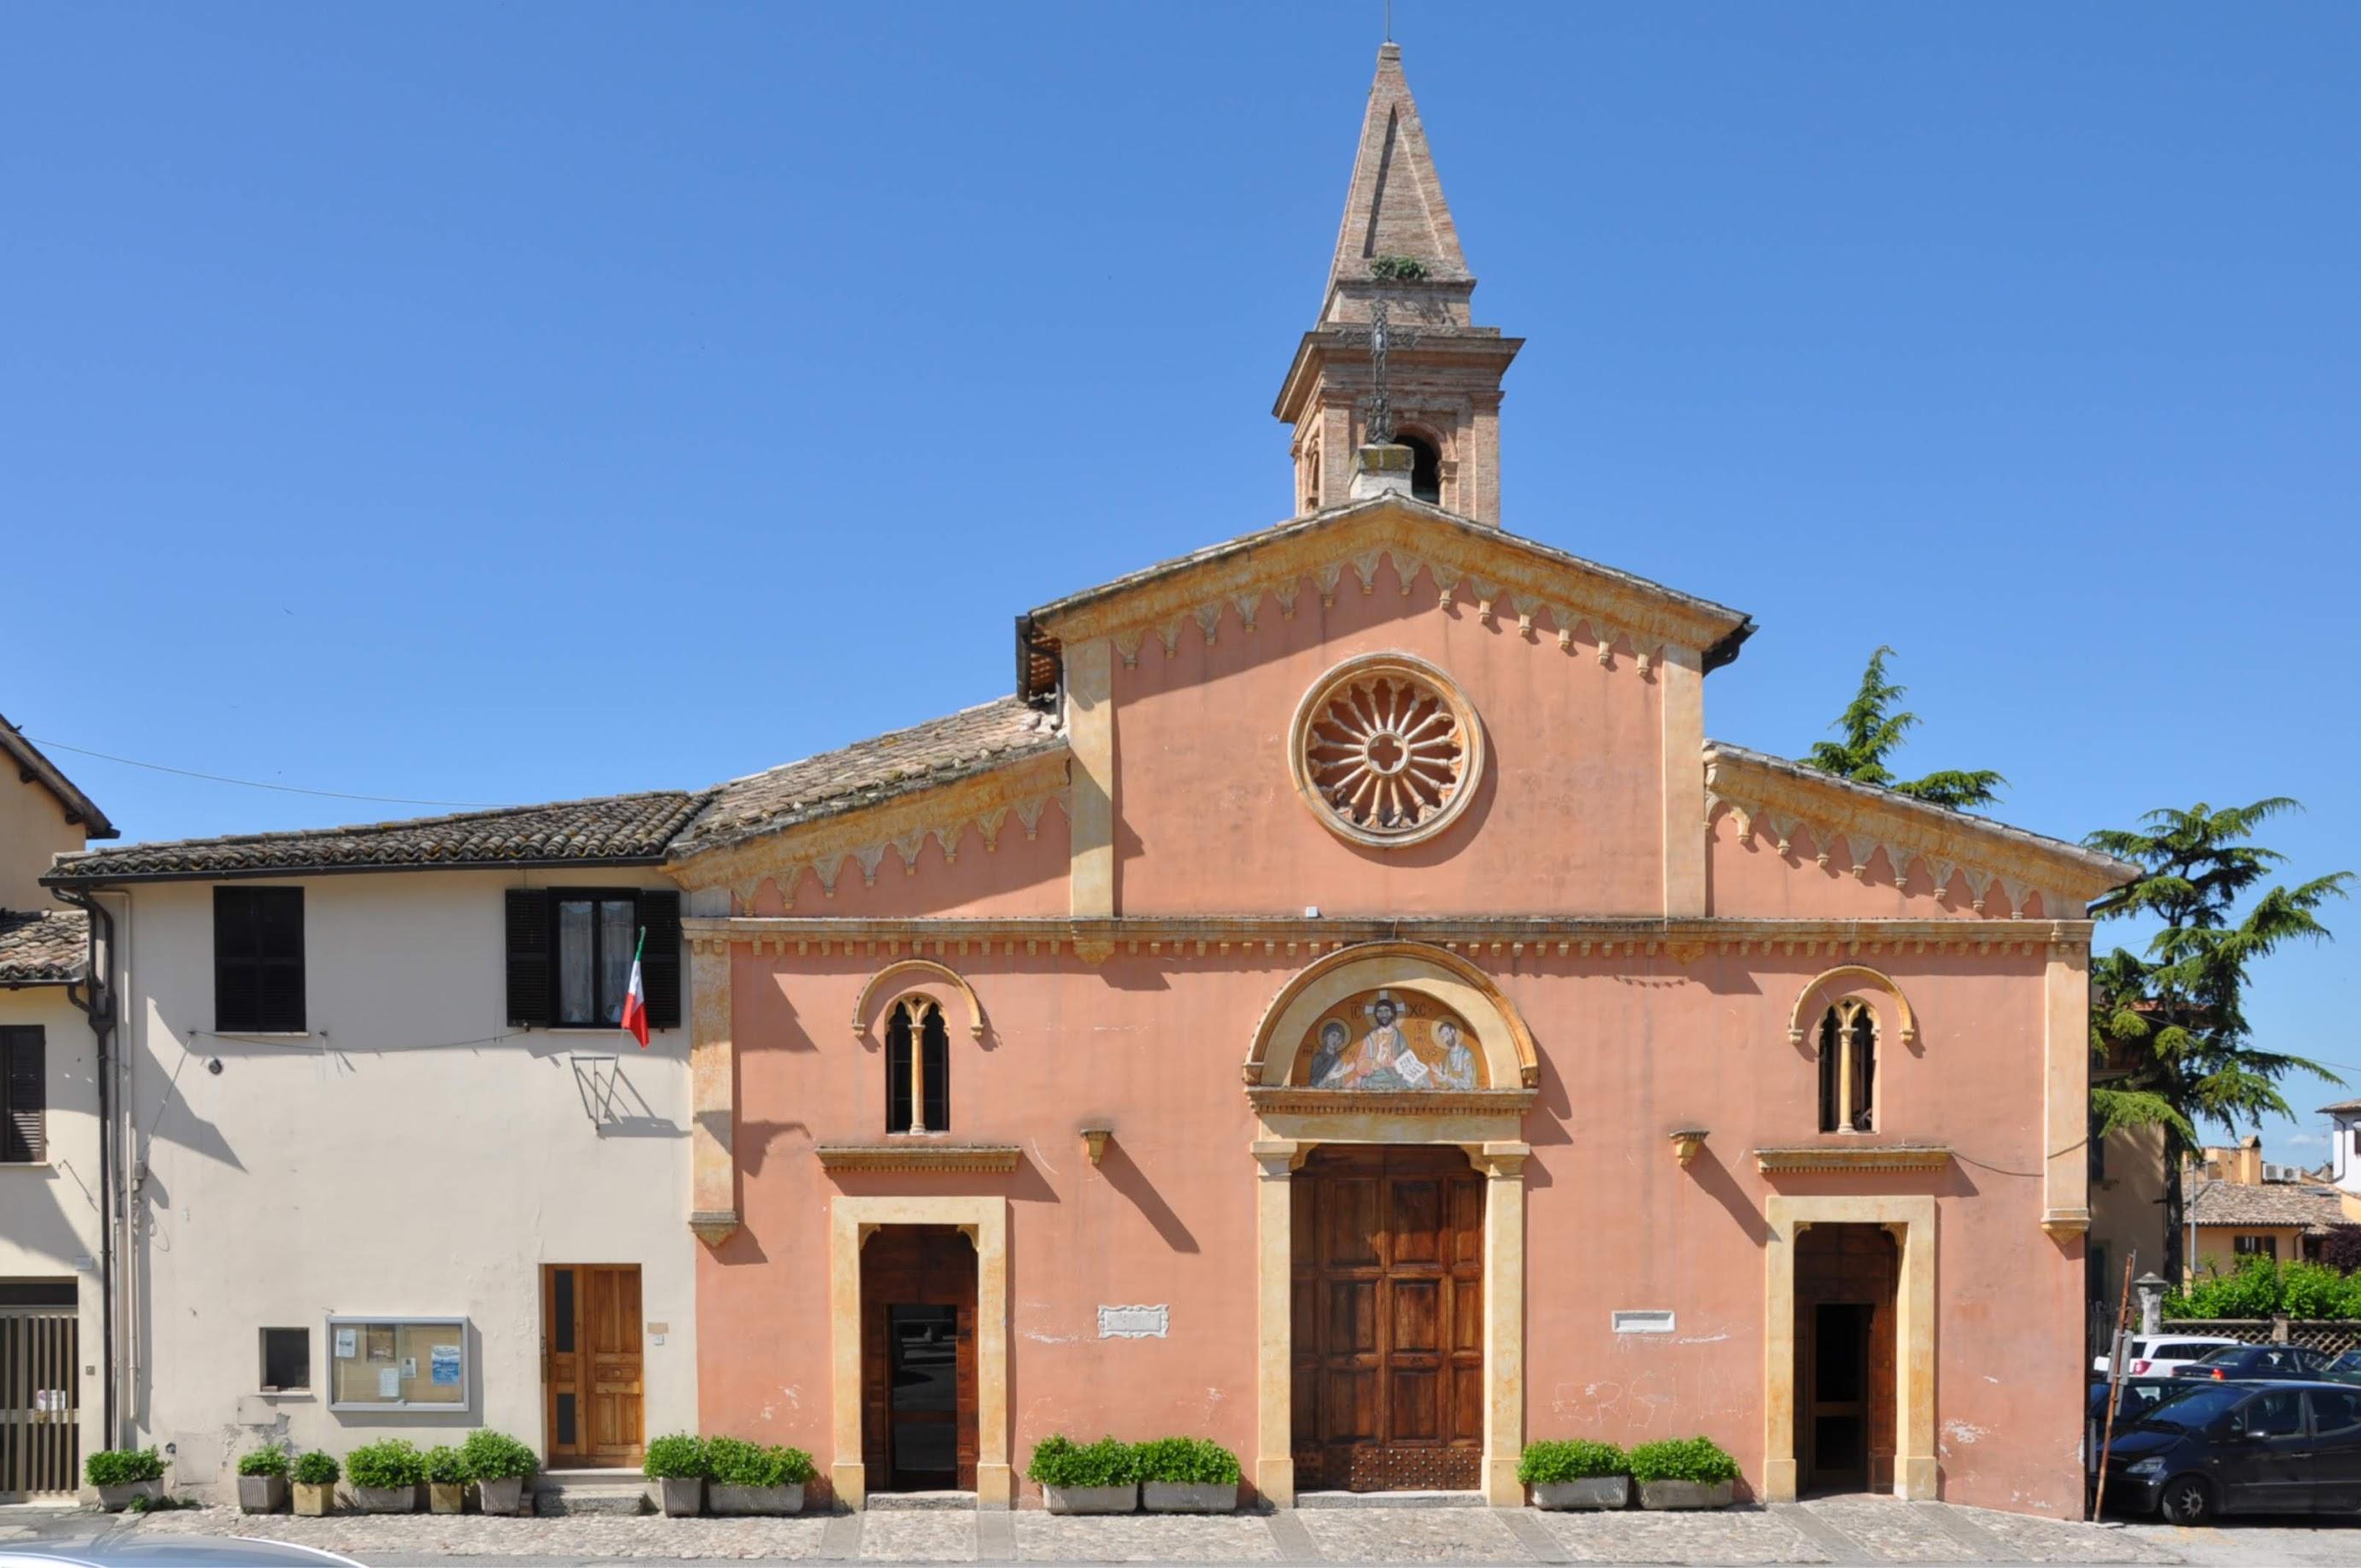 Chiesa di San Marco